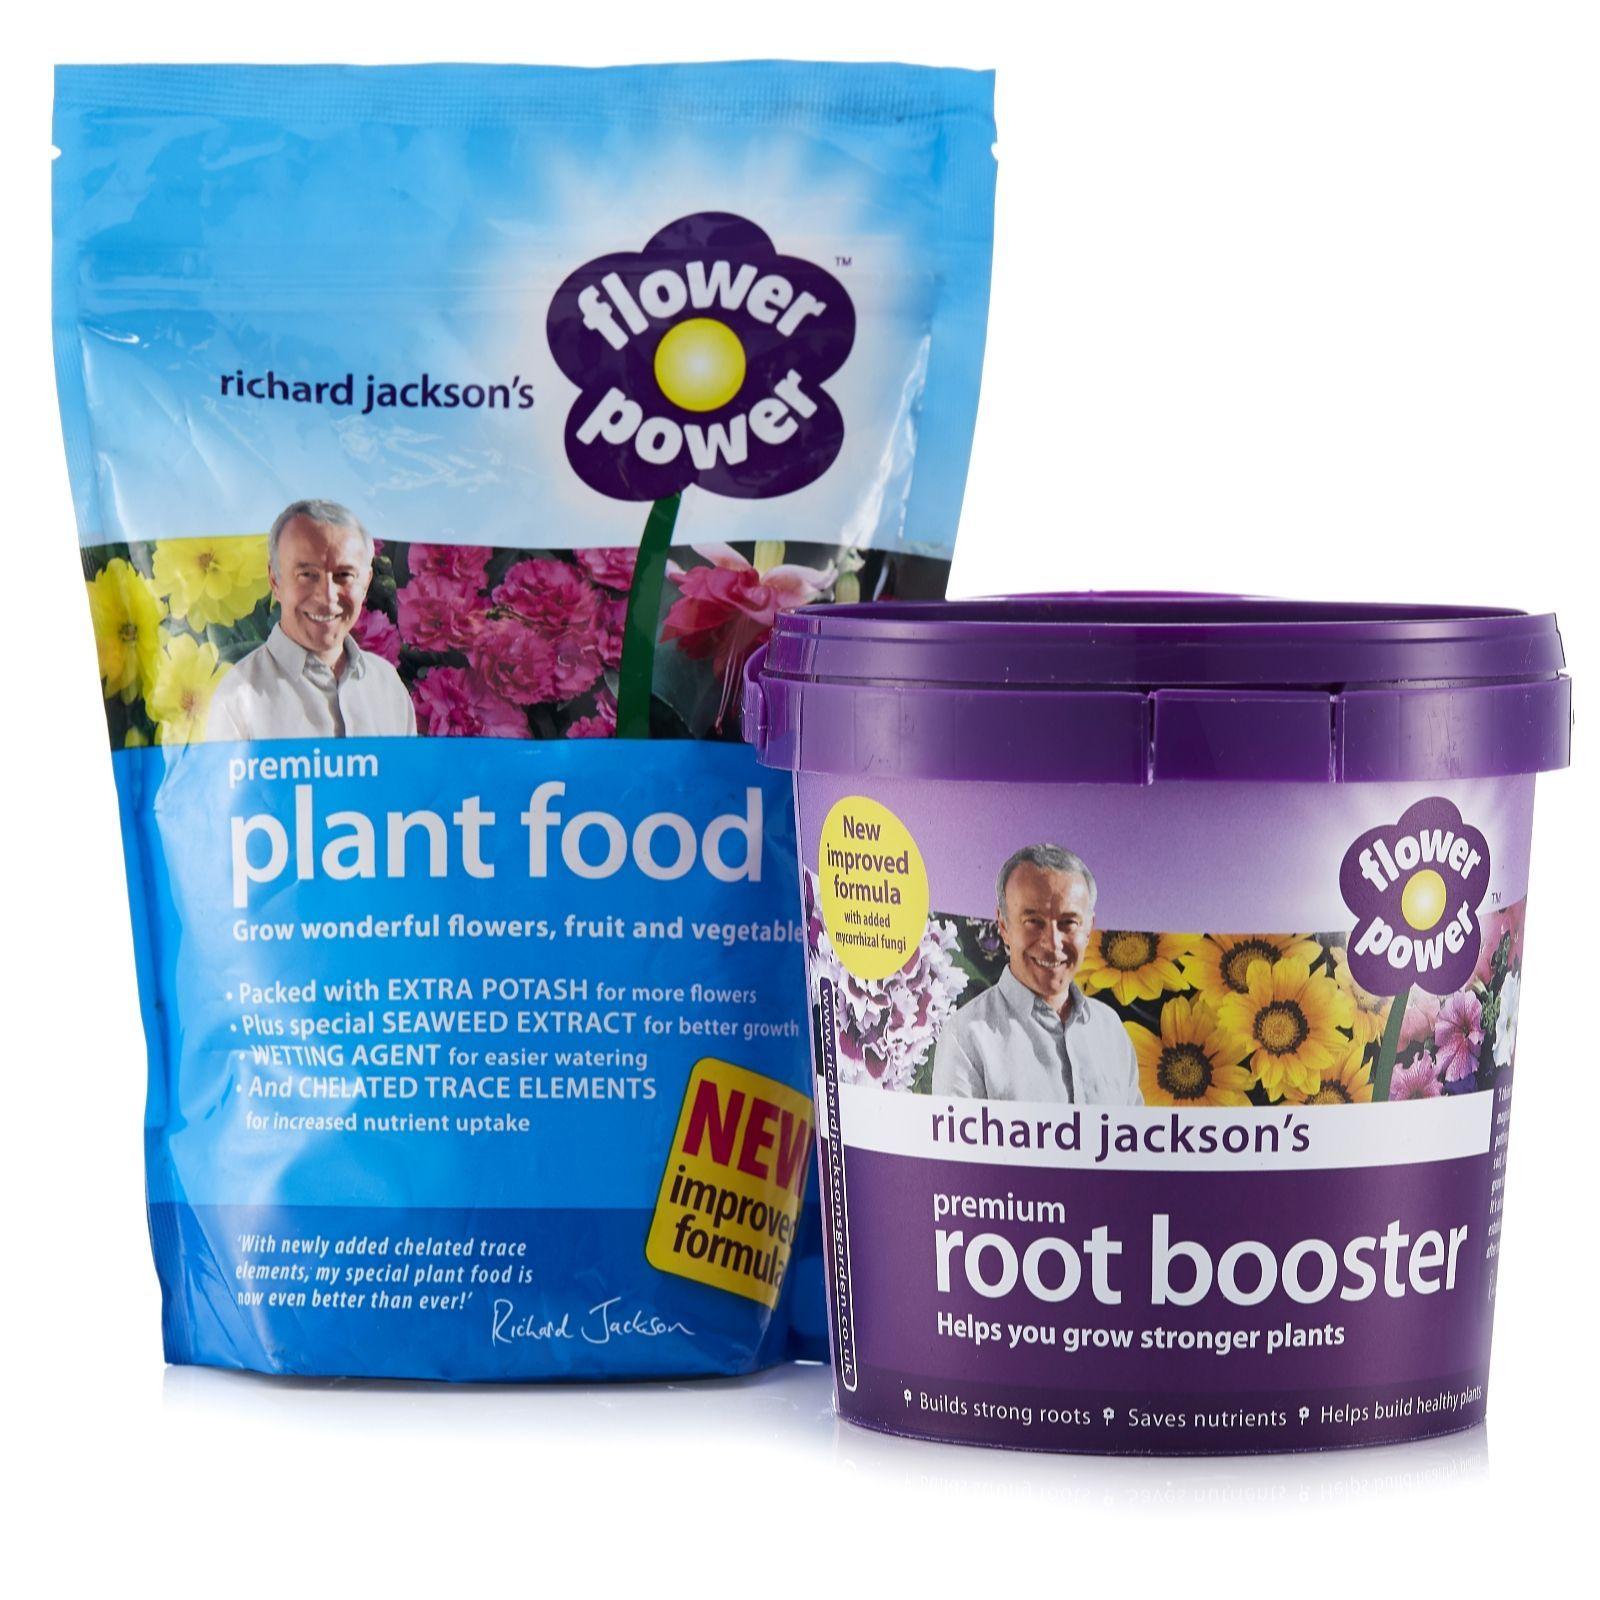 Richard Jackson S 750g Flower Power Premium Plant Food 600g Root